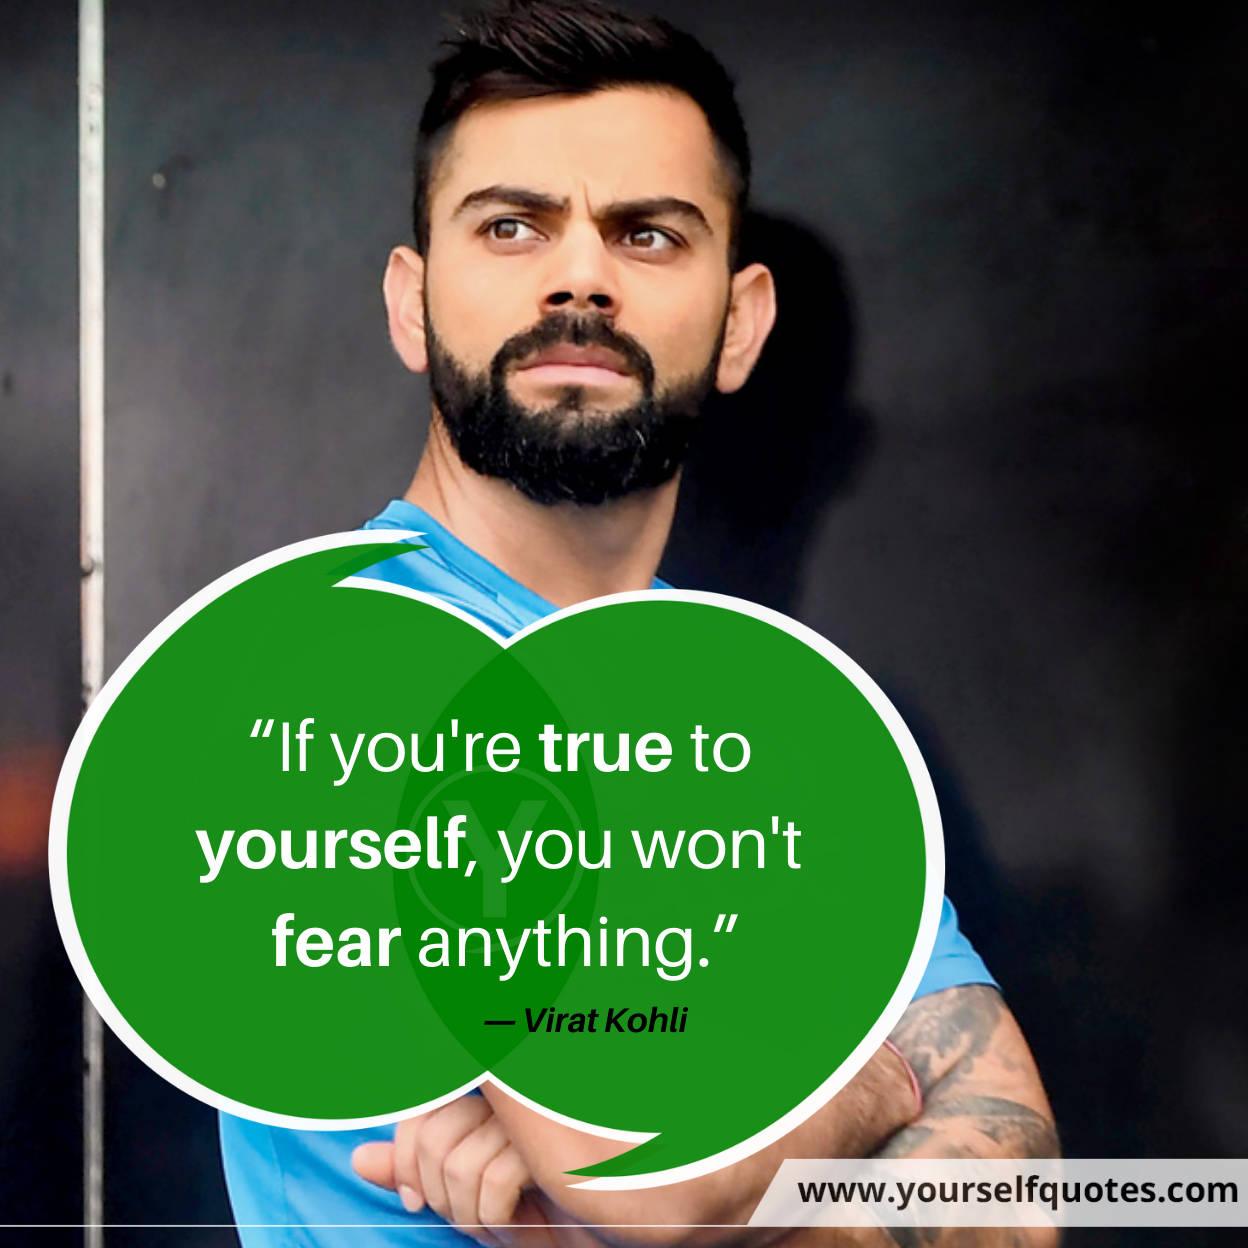 Quotes by Virat Kohli